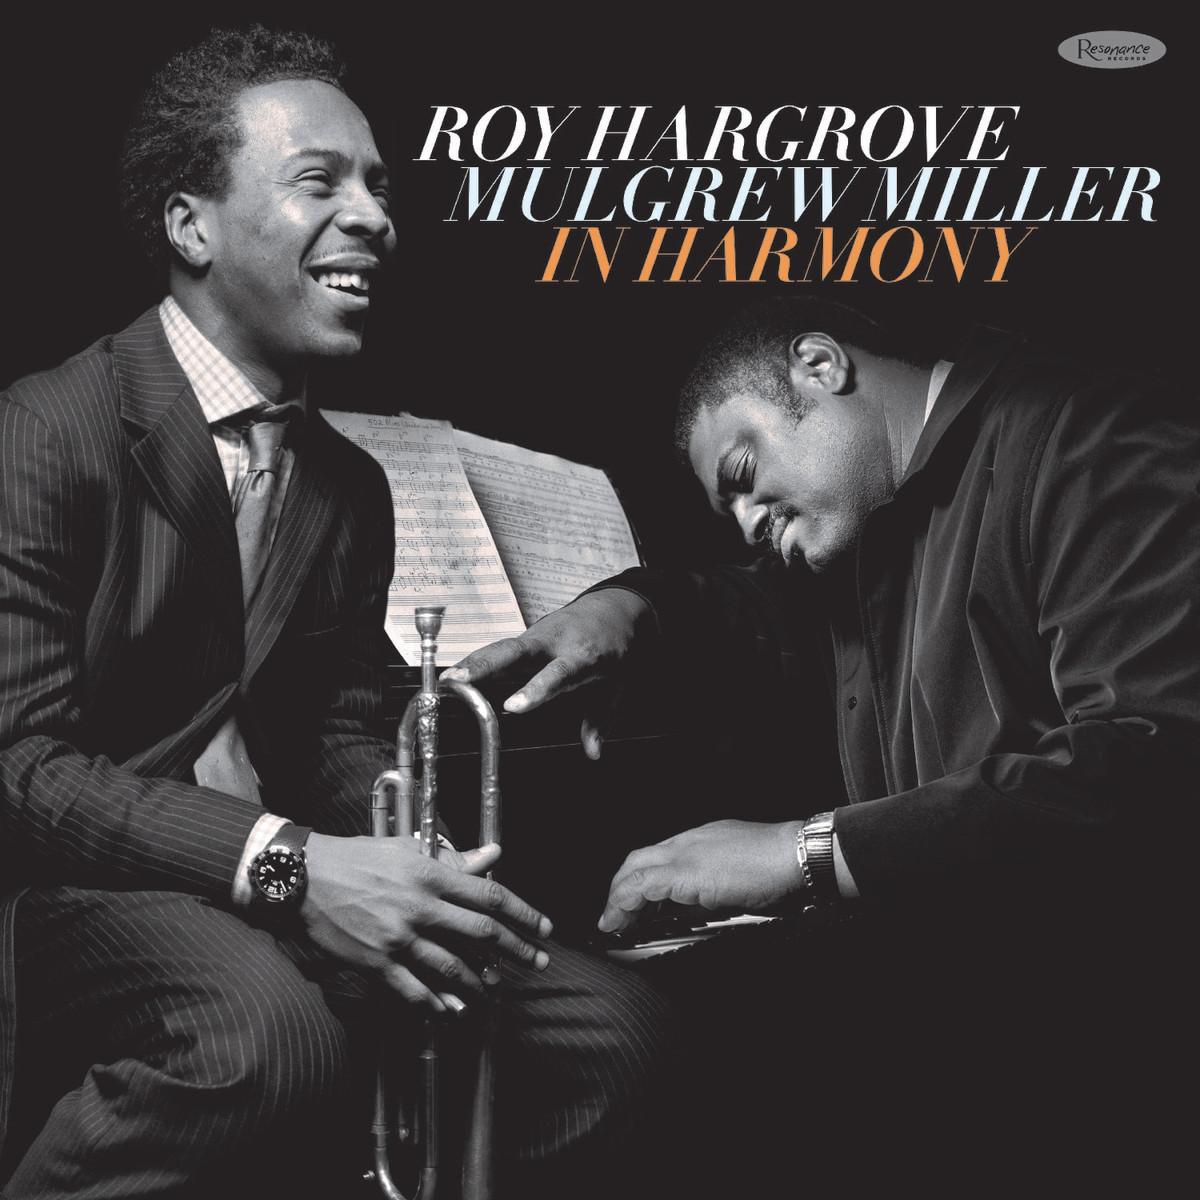 Roy Hargrove and Mulgrew Miller